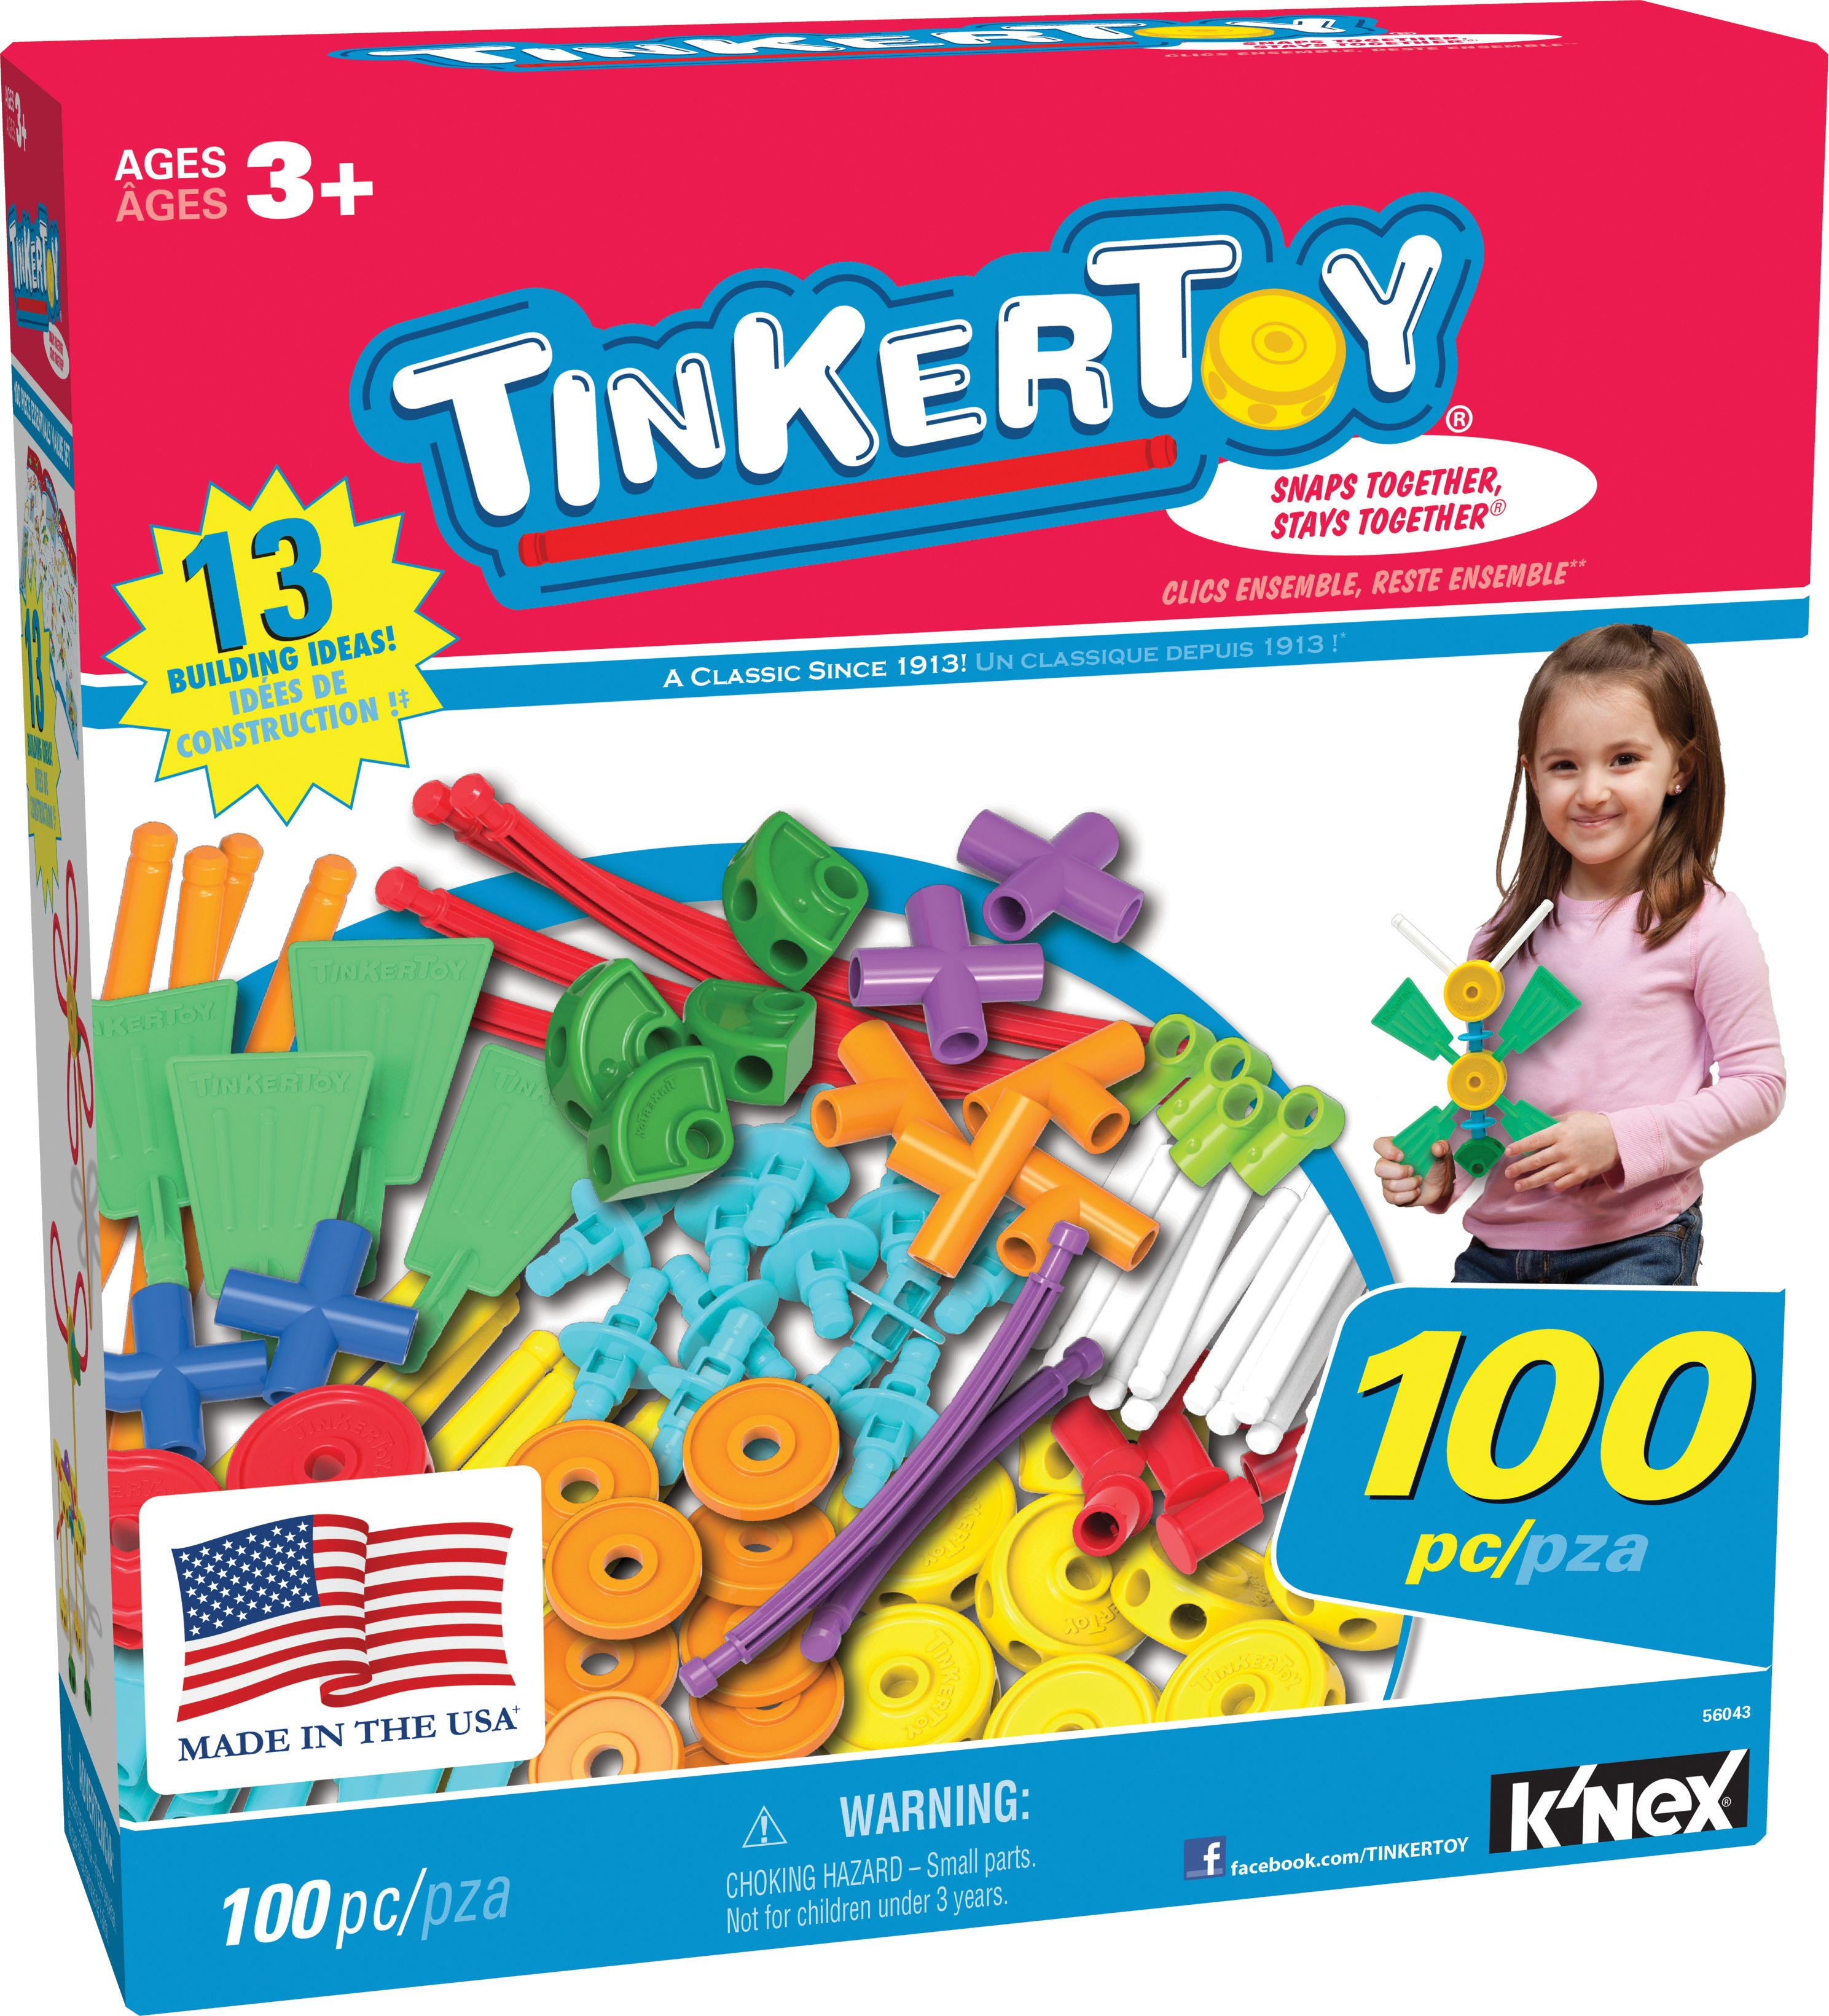 TINKERTOY - 100 Piece Essentials Value Set - Ages 3 Preschool Education Toy